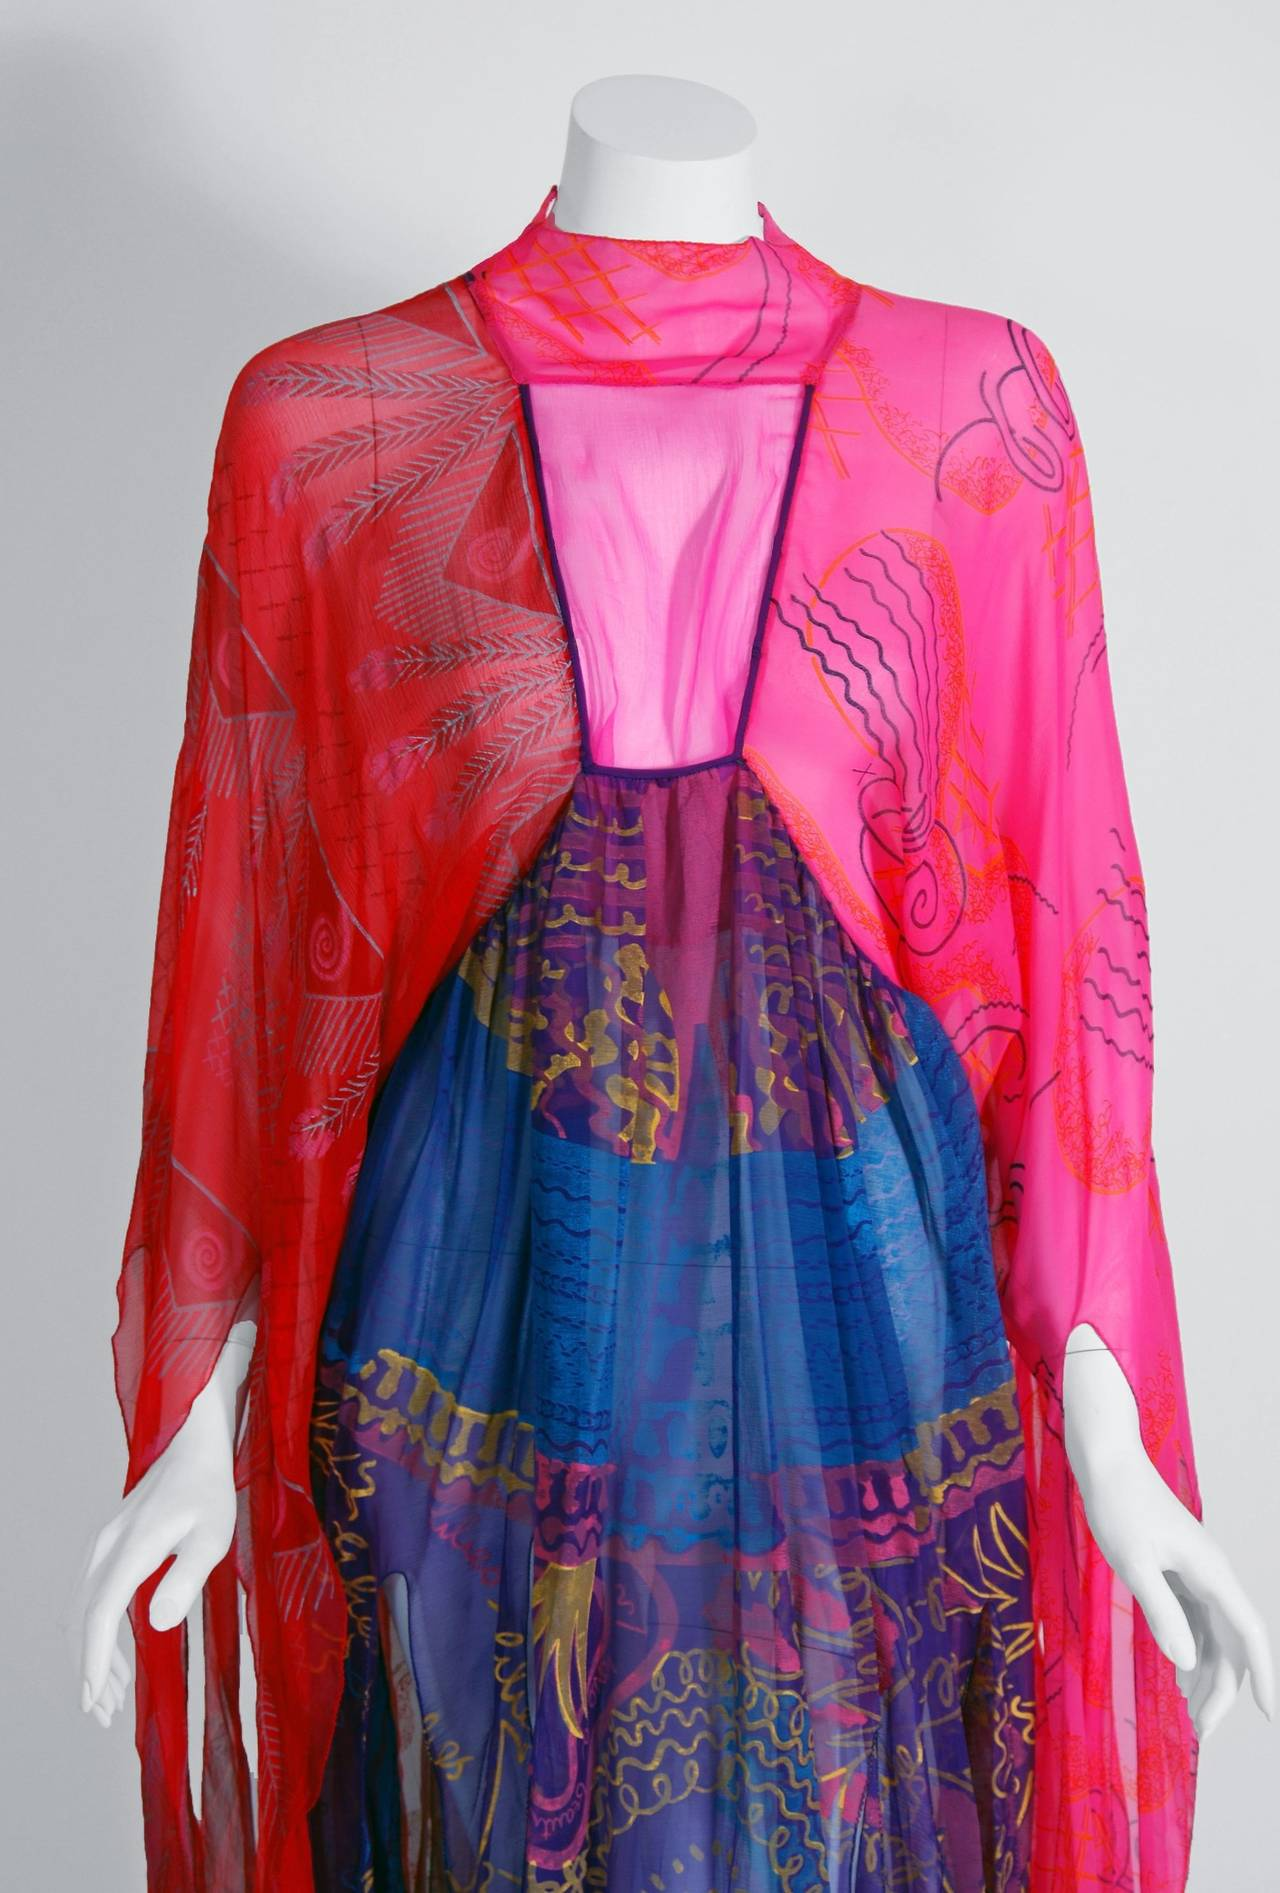 1972 Zandra Rhodes Hand-Painted Indian Feathers & Lillies Silk Caftan Dress 2